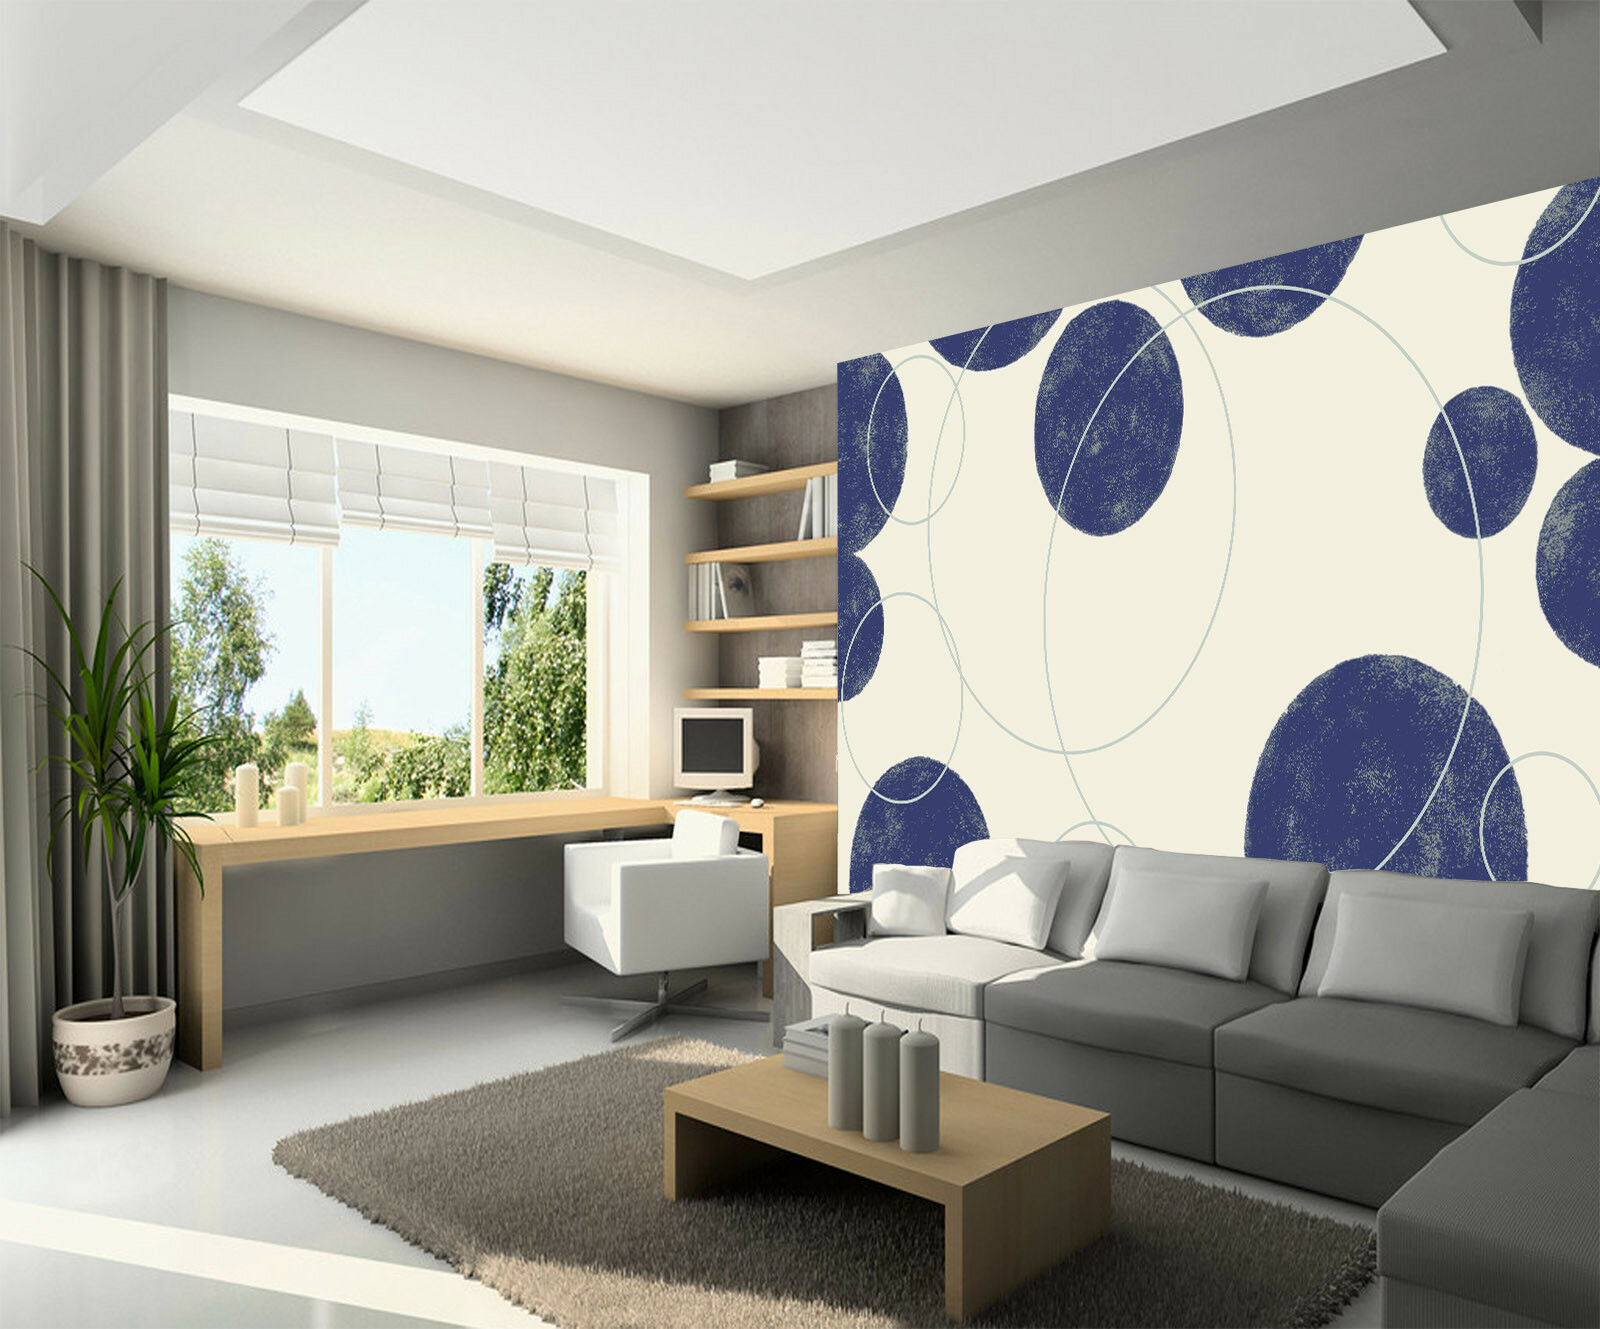 3D Blauer Punkt Kreis 8 Tapete Wandgemälde Tapete Tapeten Bild Familie DE Summer | Kompletter Spezifikationsbereich  | Feinen Qualität  | Sonderpreis